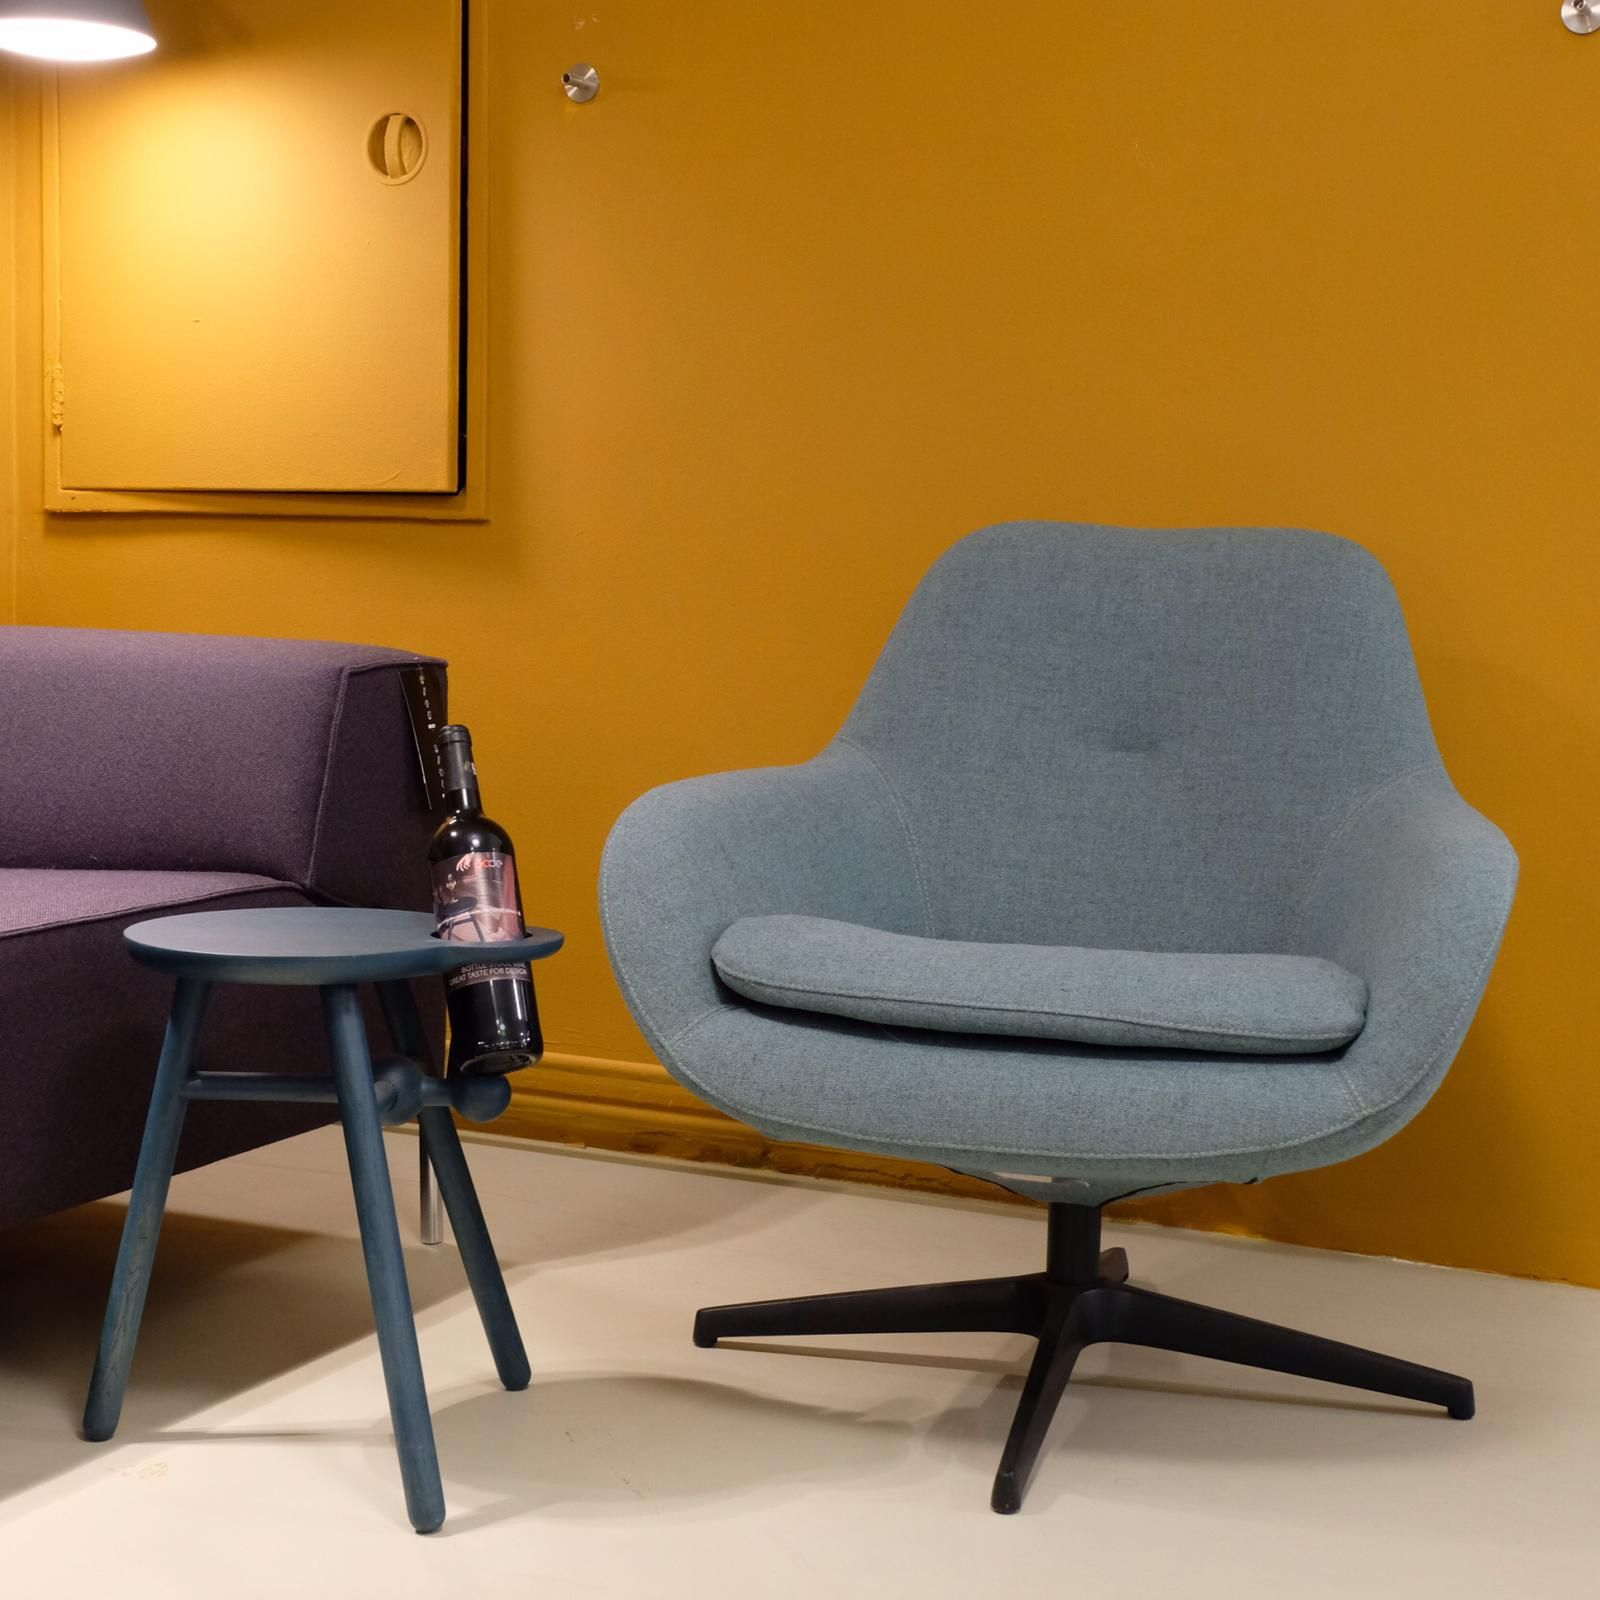 Design Fauteuil Spot van Pode